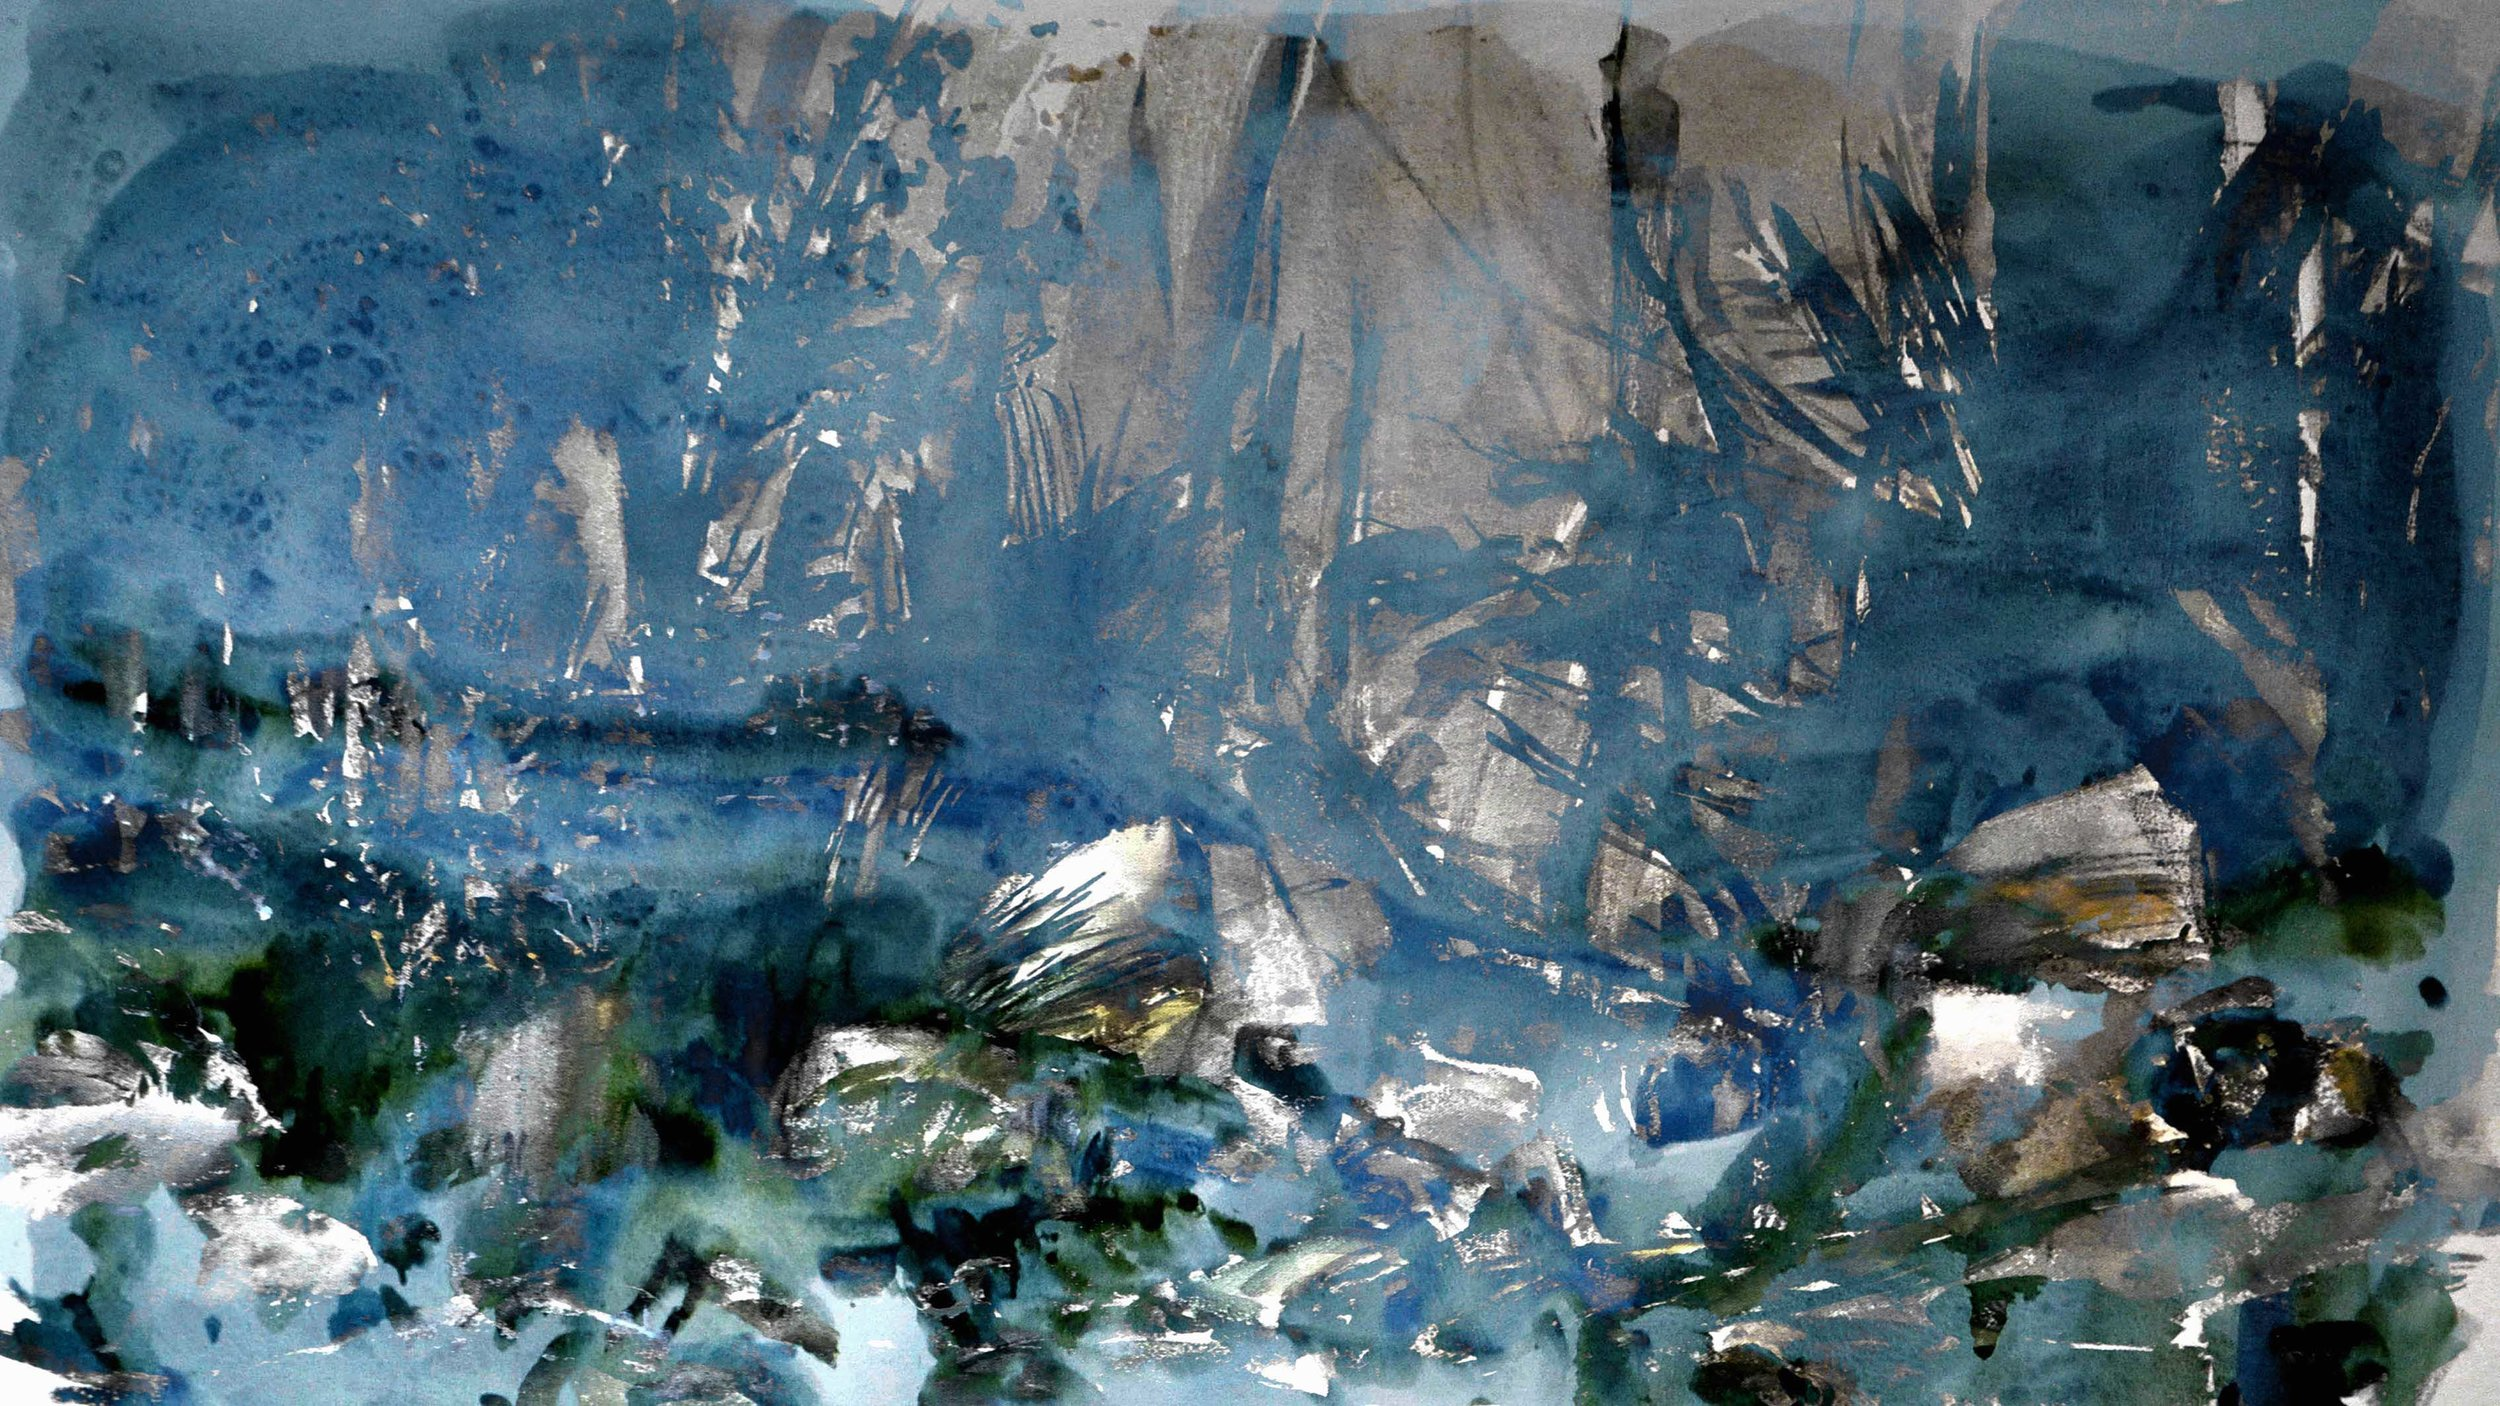 Marais 1, digital painting, dimensions variable, 2016